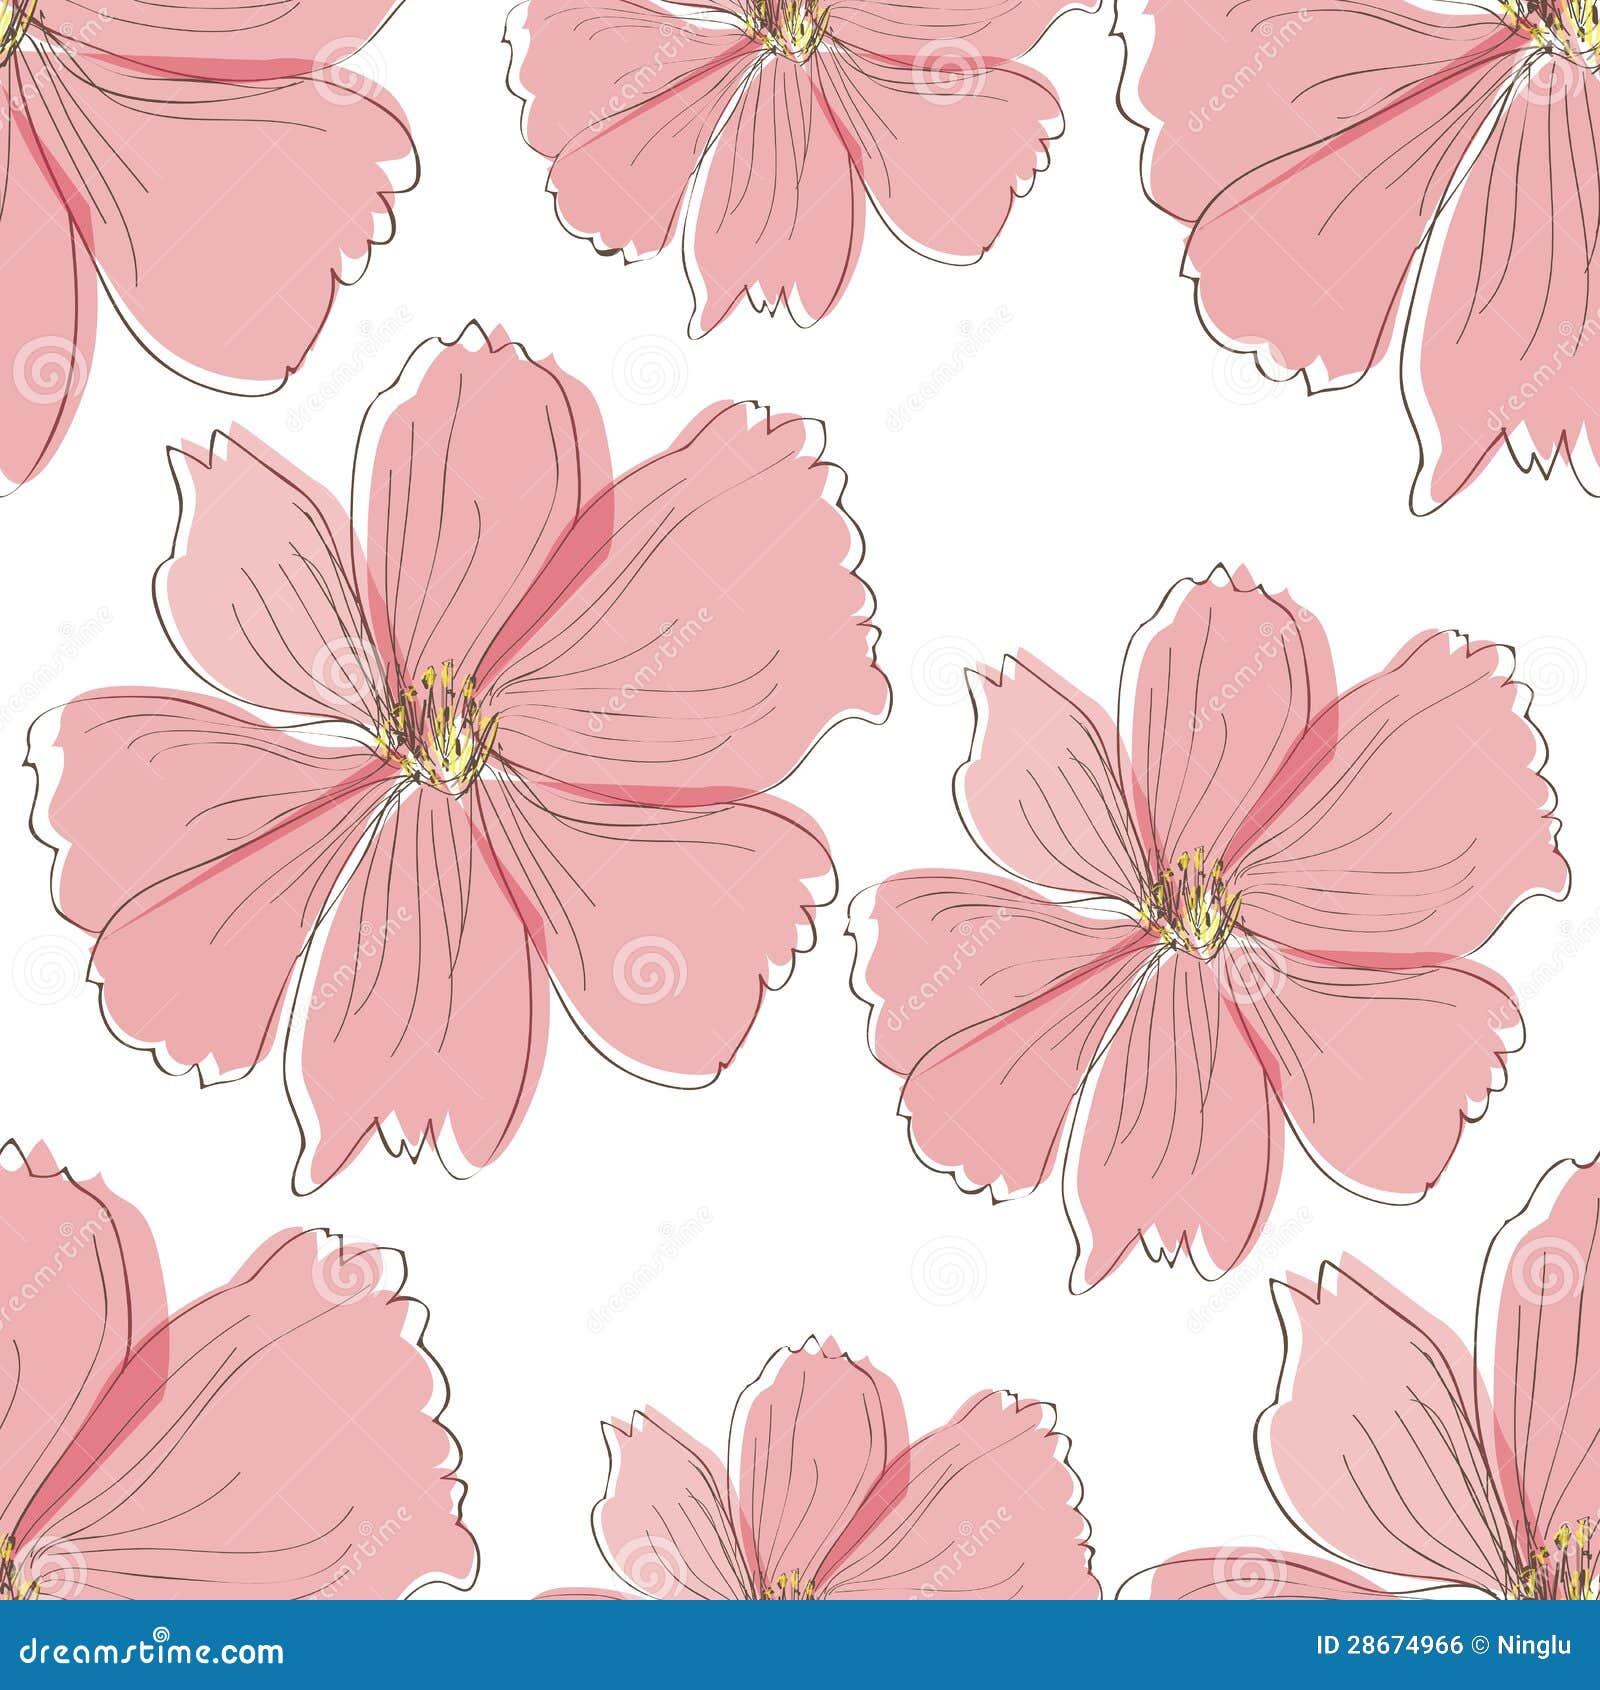 Seamless pink flower pattern stock illustration illustration of seamless pink flower pattern mightylinksfo